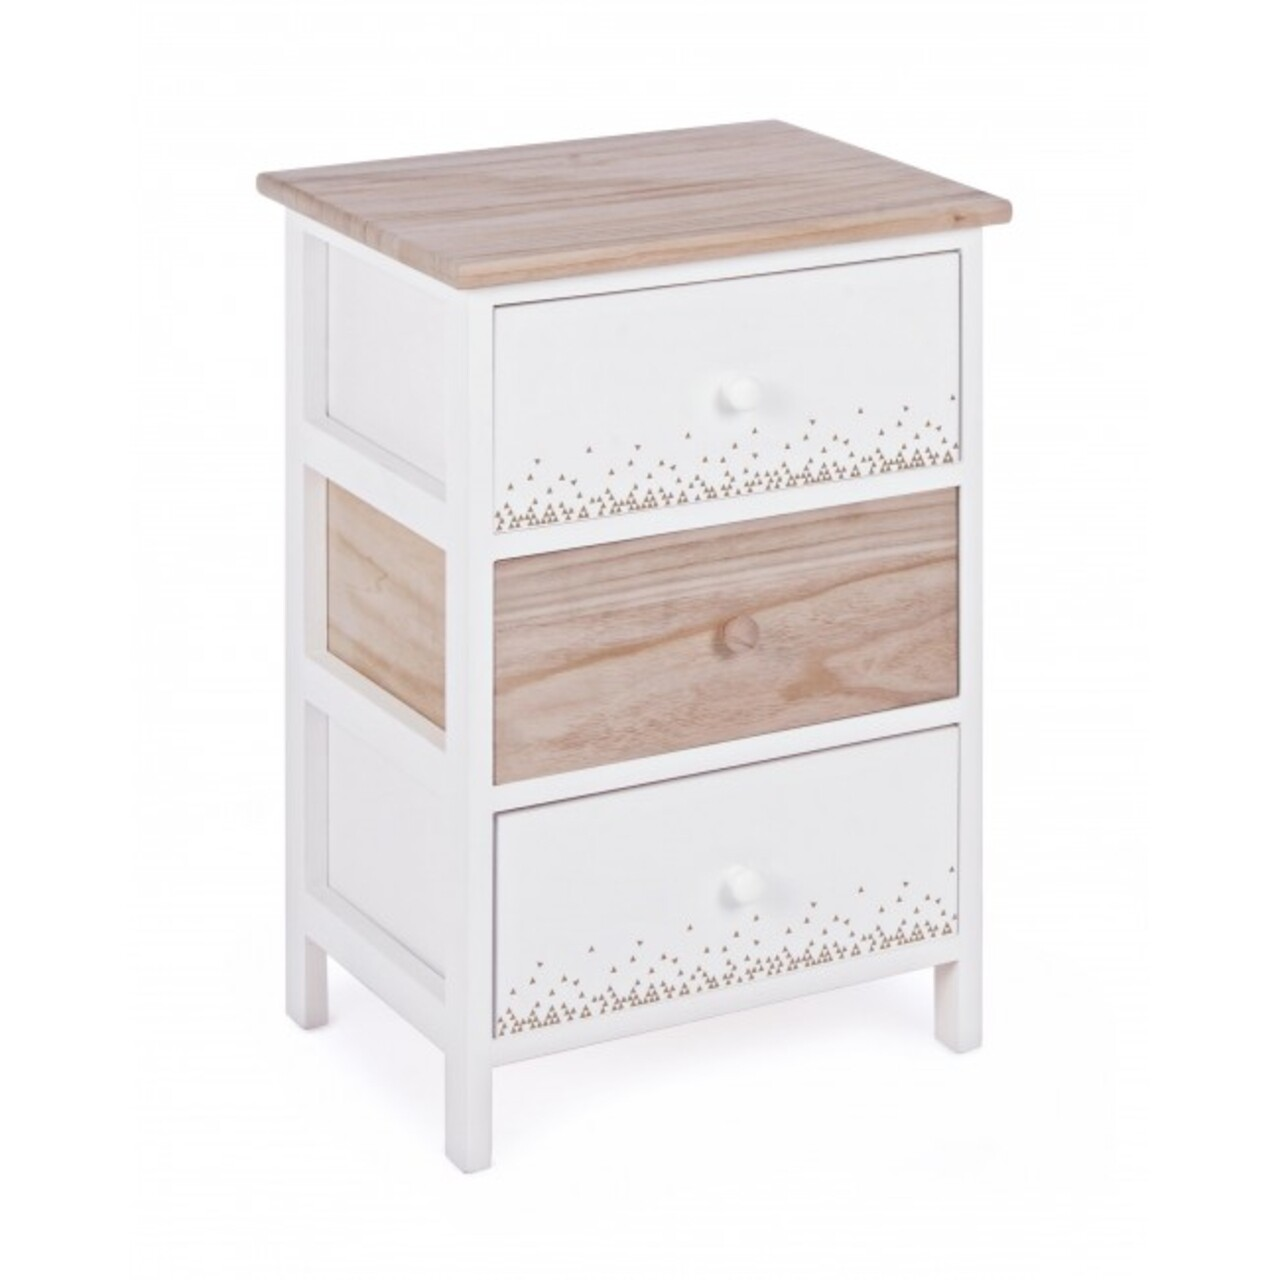 Comoda cu 3 sertare, Ally, Bizzotto, 40x29x58 cm, lemn de paulownia, alb/natural